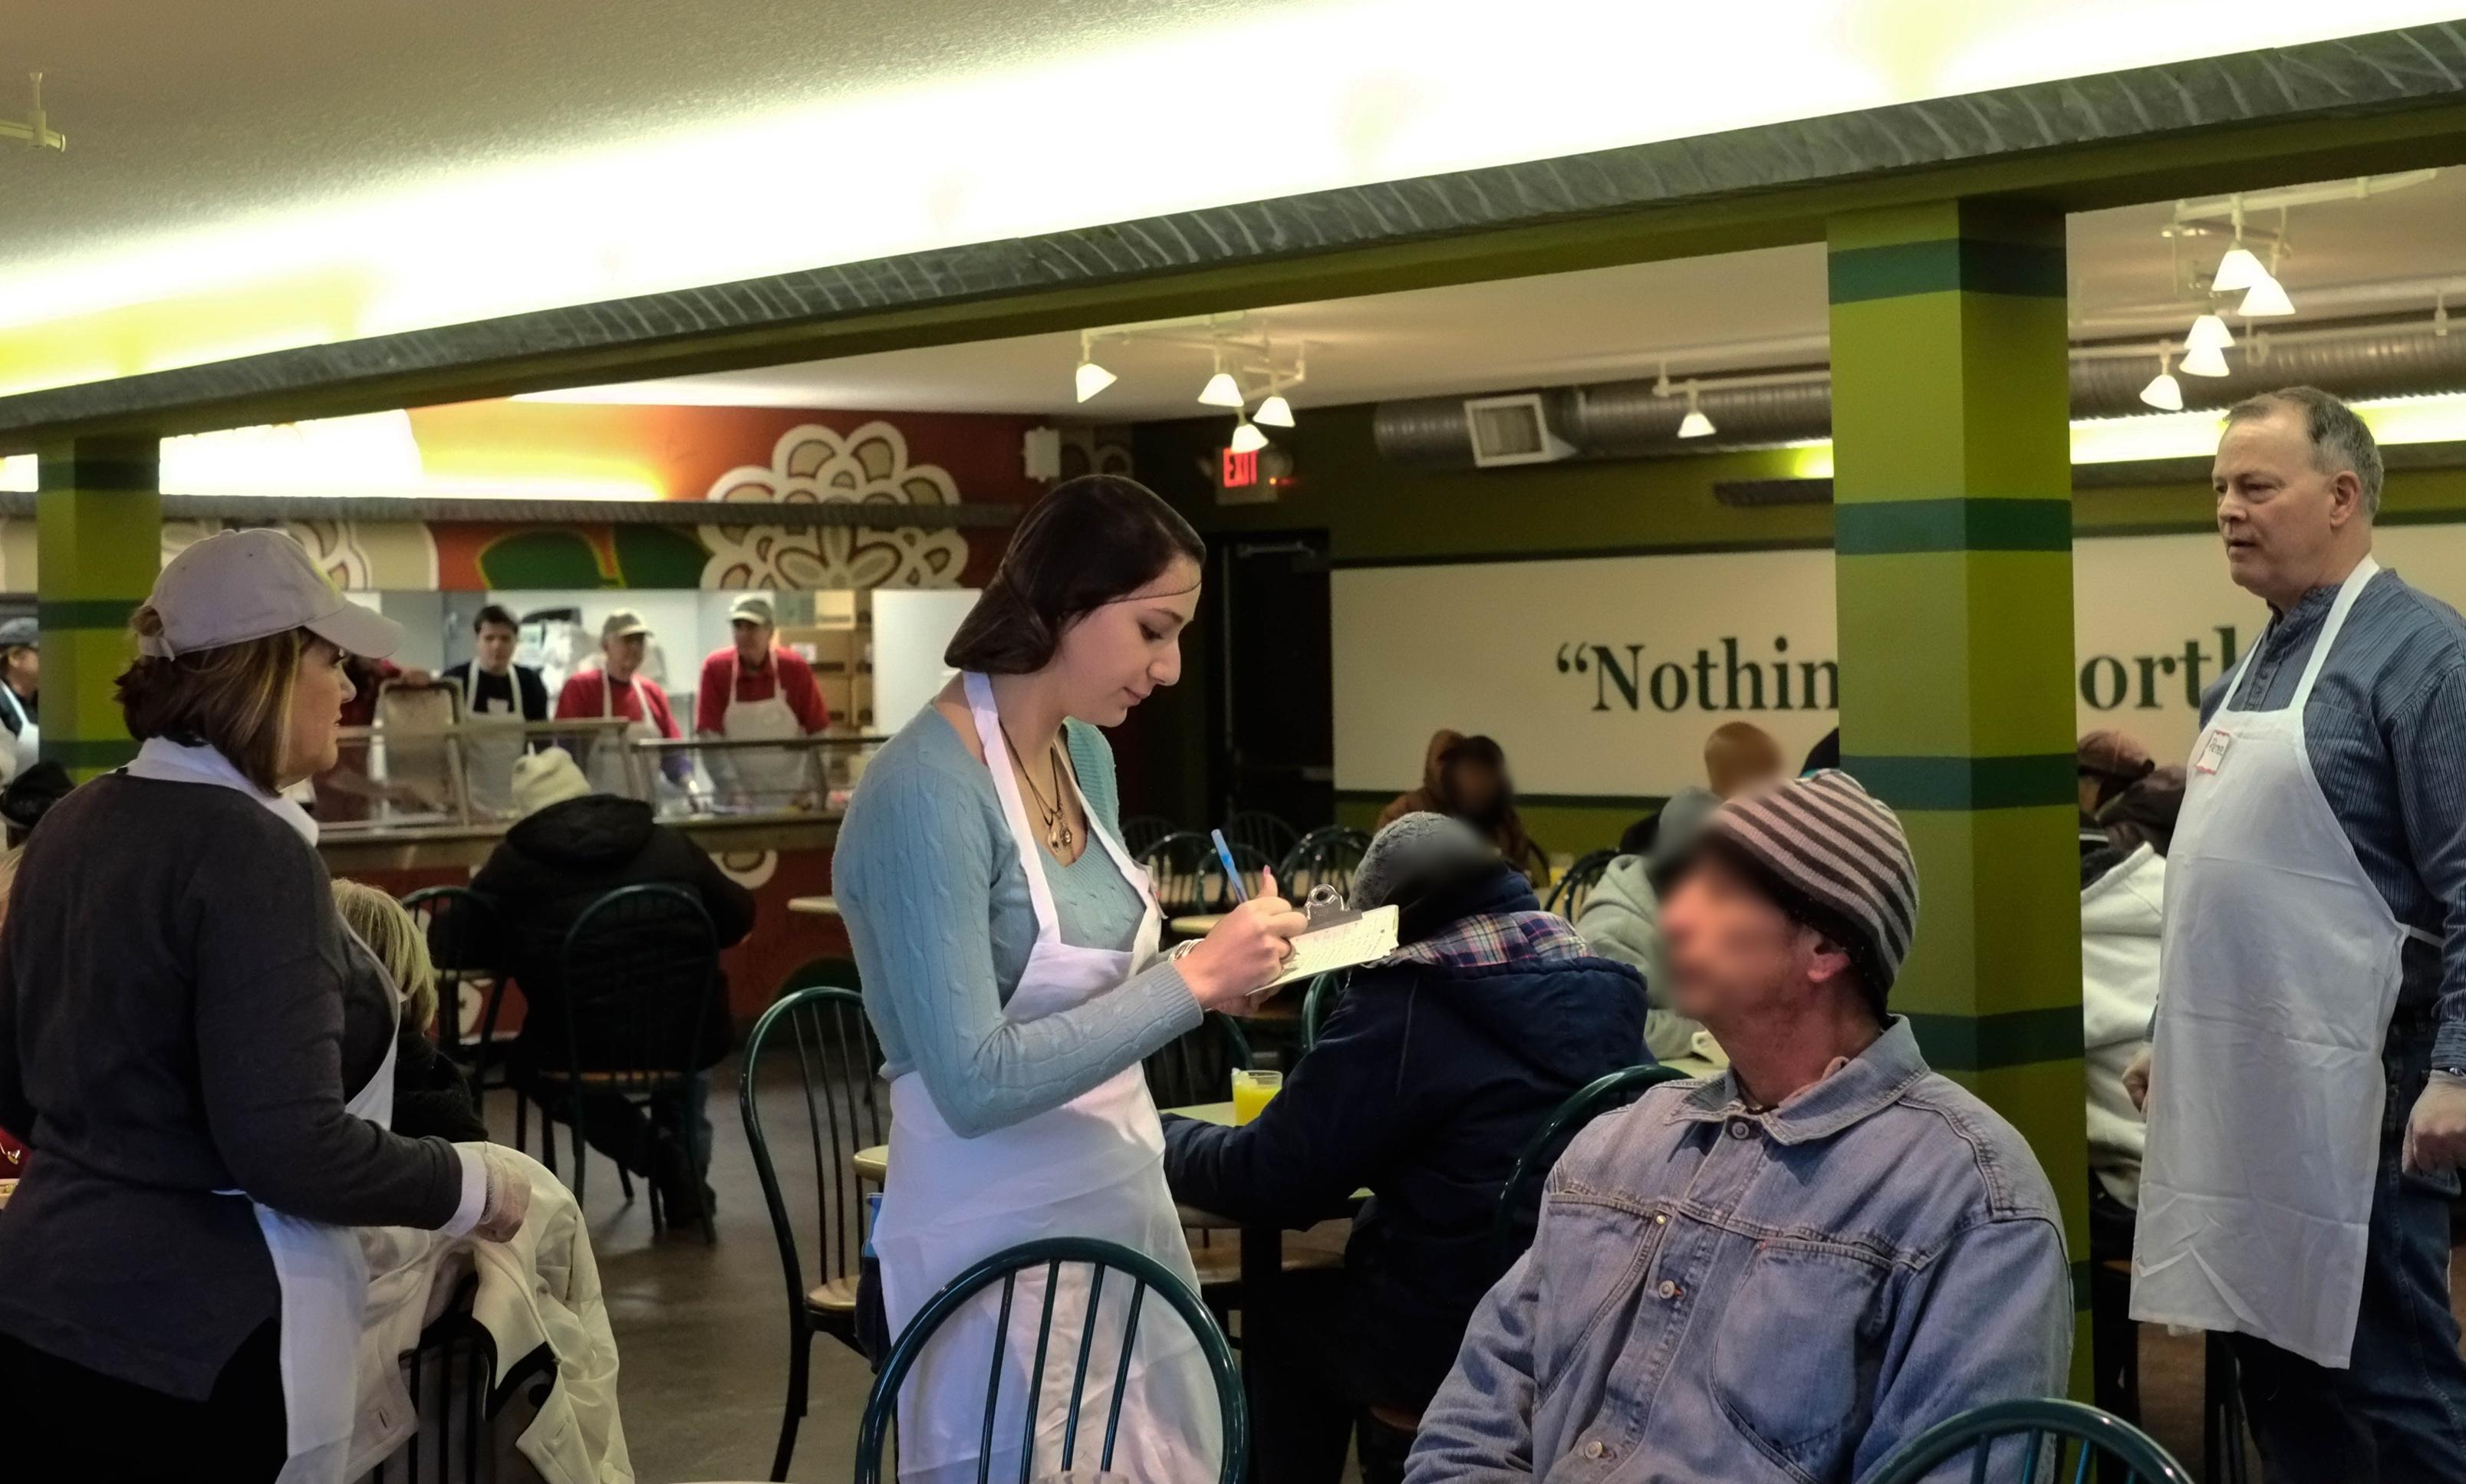 restaurante en kansas 03